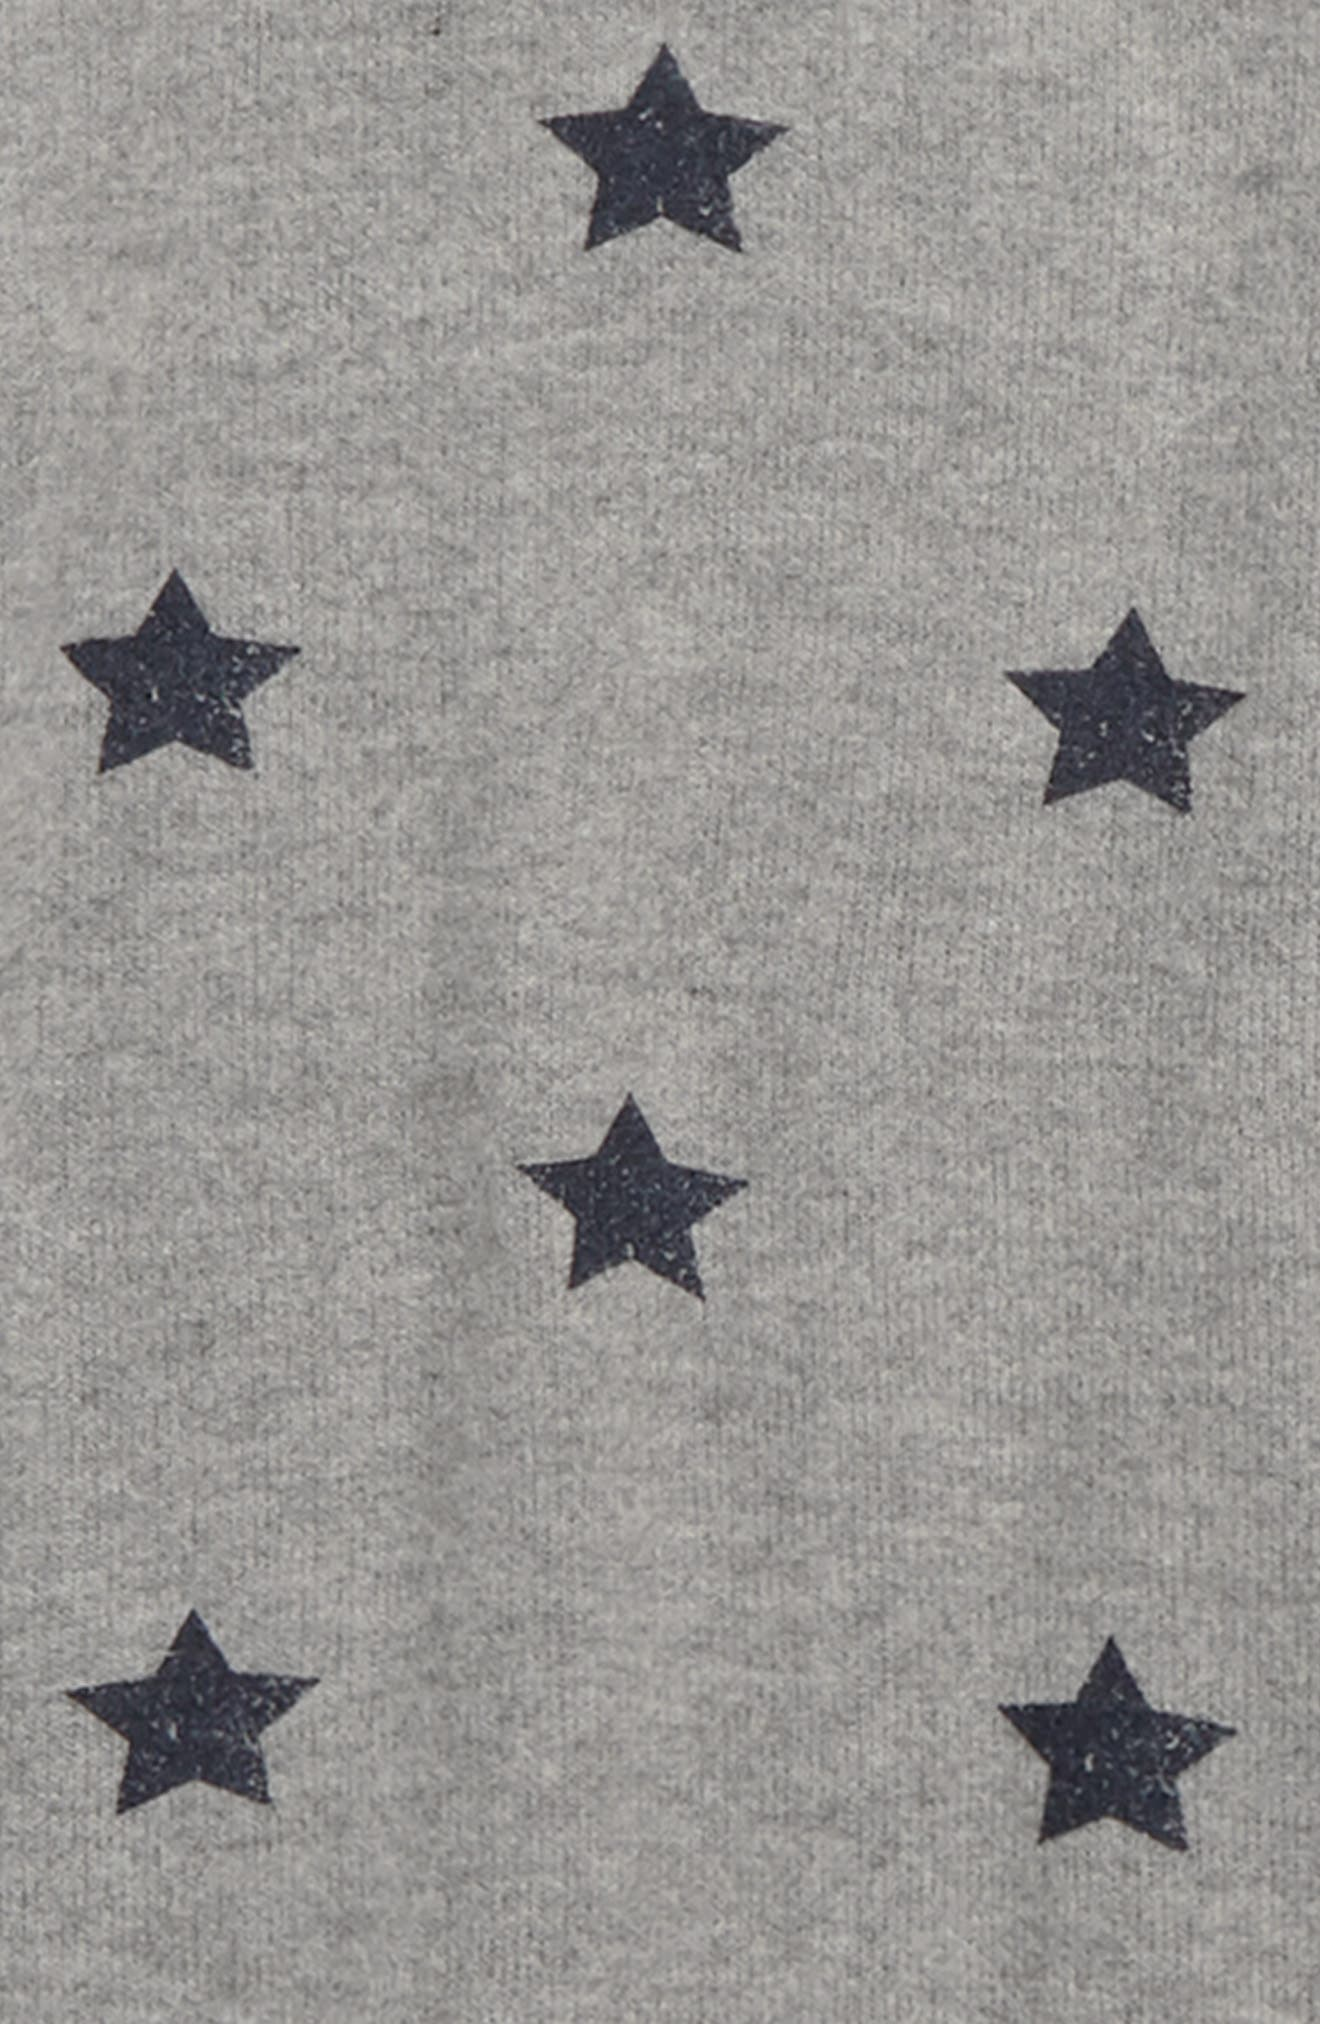 Super Star Two-Piece Pajamas,                             Alternate thumbnail 2, color,                             NAVY